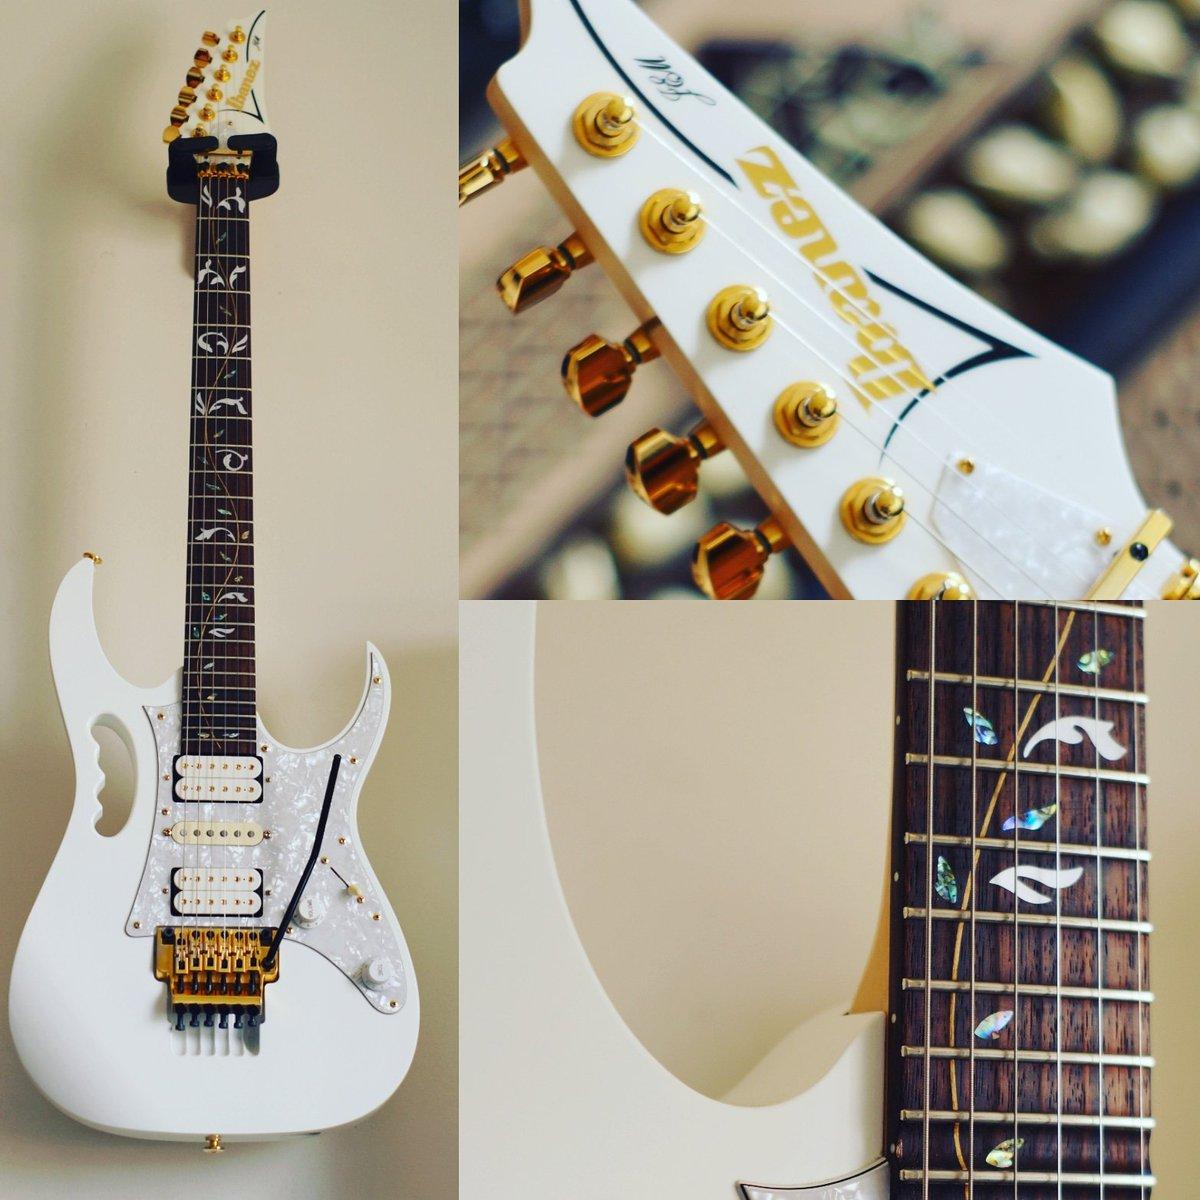 Angel the Jem7v say hi.. http://Rabihsaad.net #ibanez #ibanezguitars #ibanezjem #ibanezjem7v #guitarra #electricguitar #whiteguitar #guitarmania #guitarphotography #stevevai #metalguitarist #shredguitar #guitarshred #vineinlays #dimarzio #guitarlandpic.twitter.com/xUpVyqVH0H